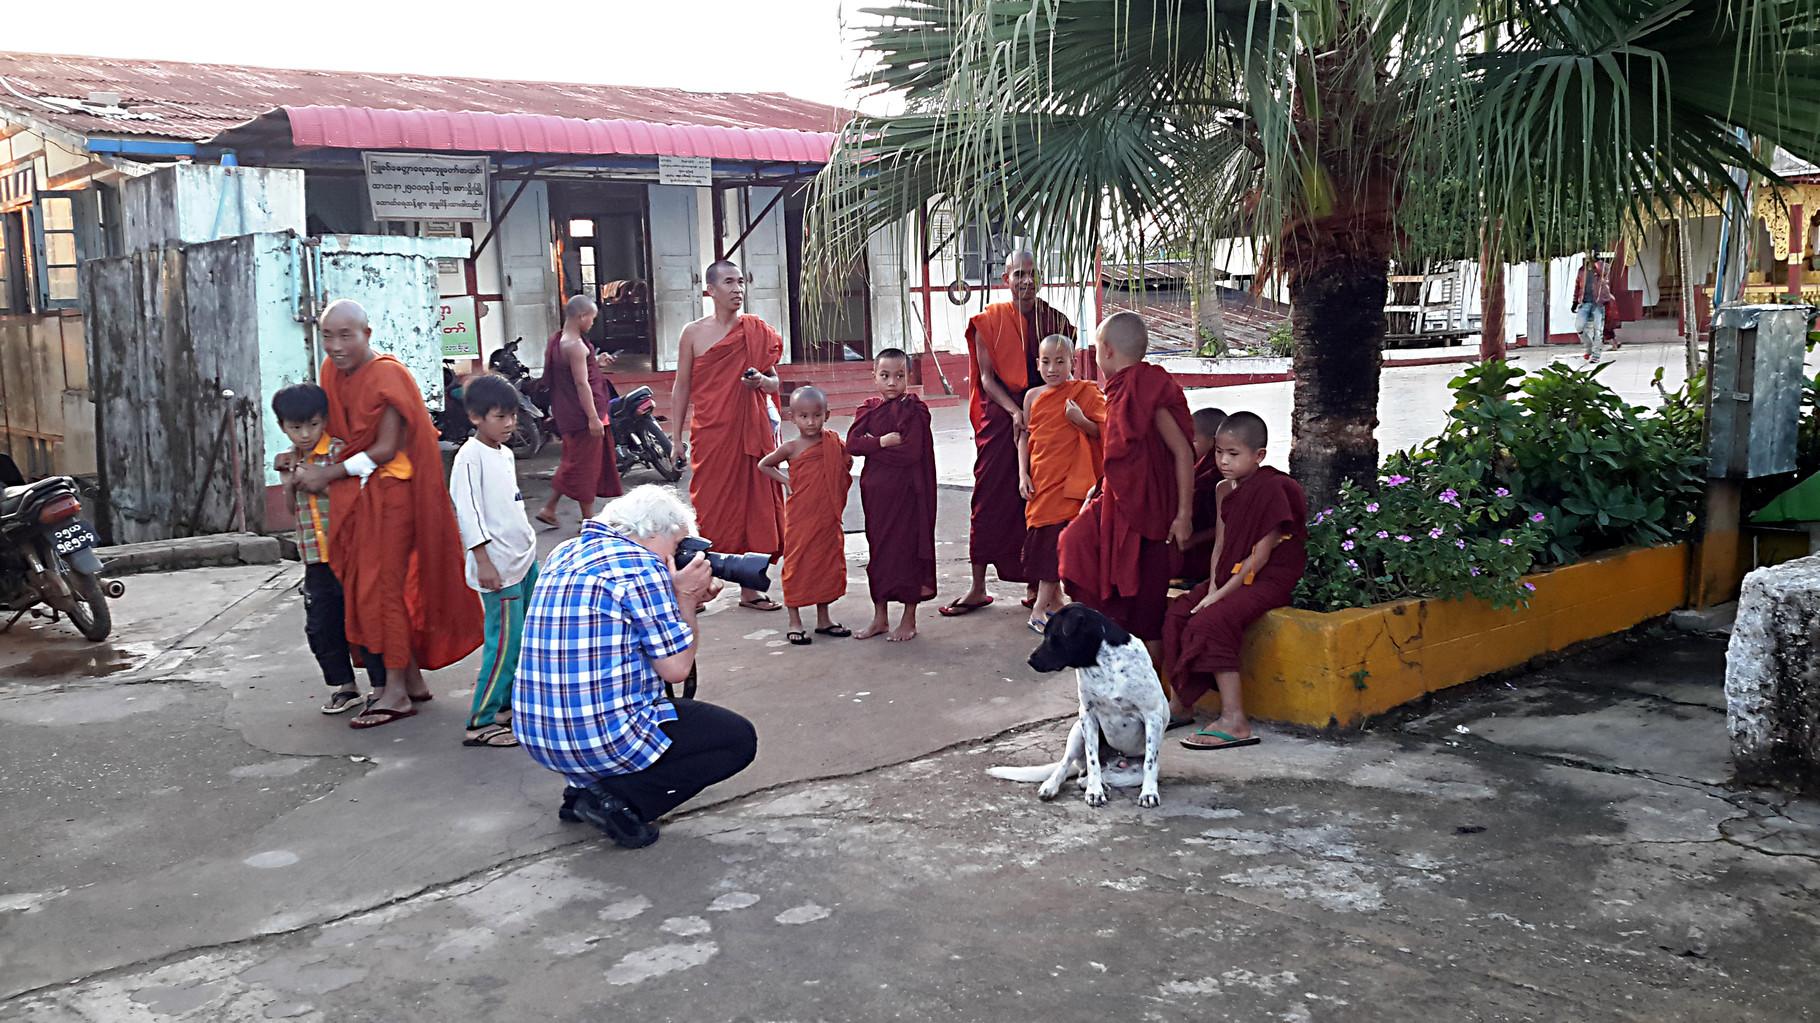 Lasho (Burma) Okt. 2015. Foto Dr. Yamin